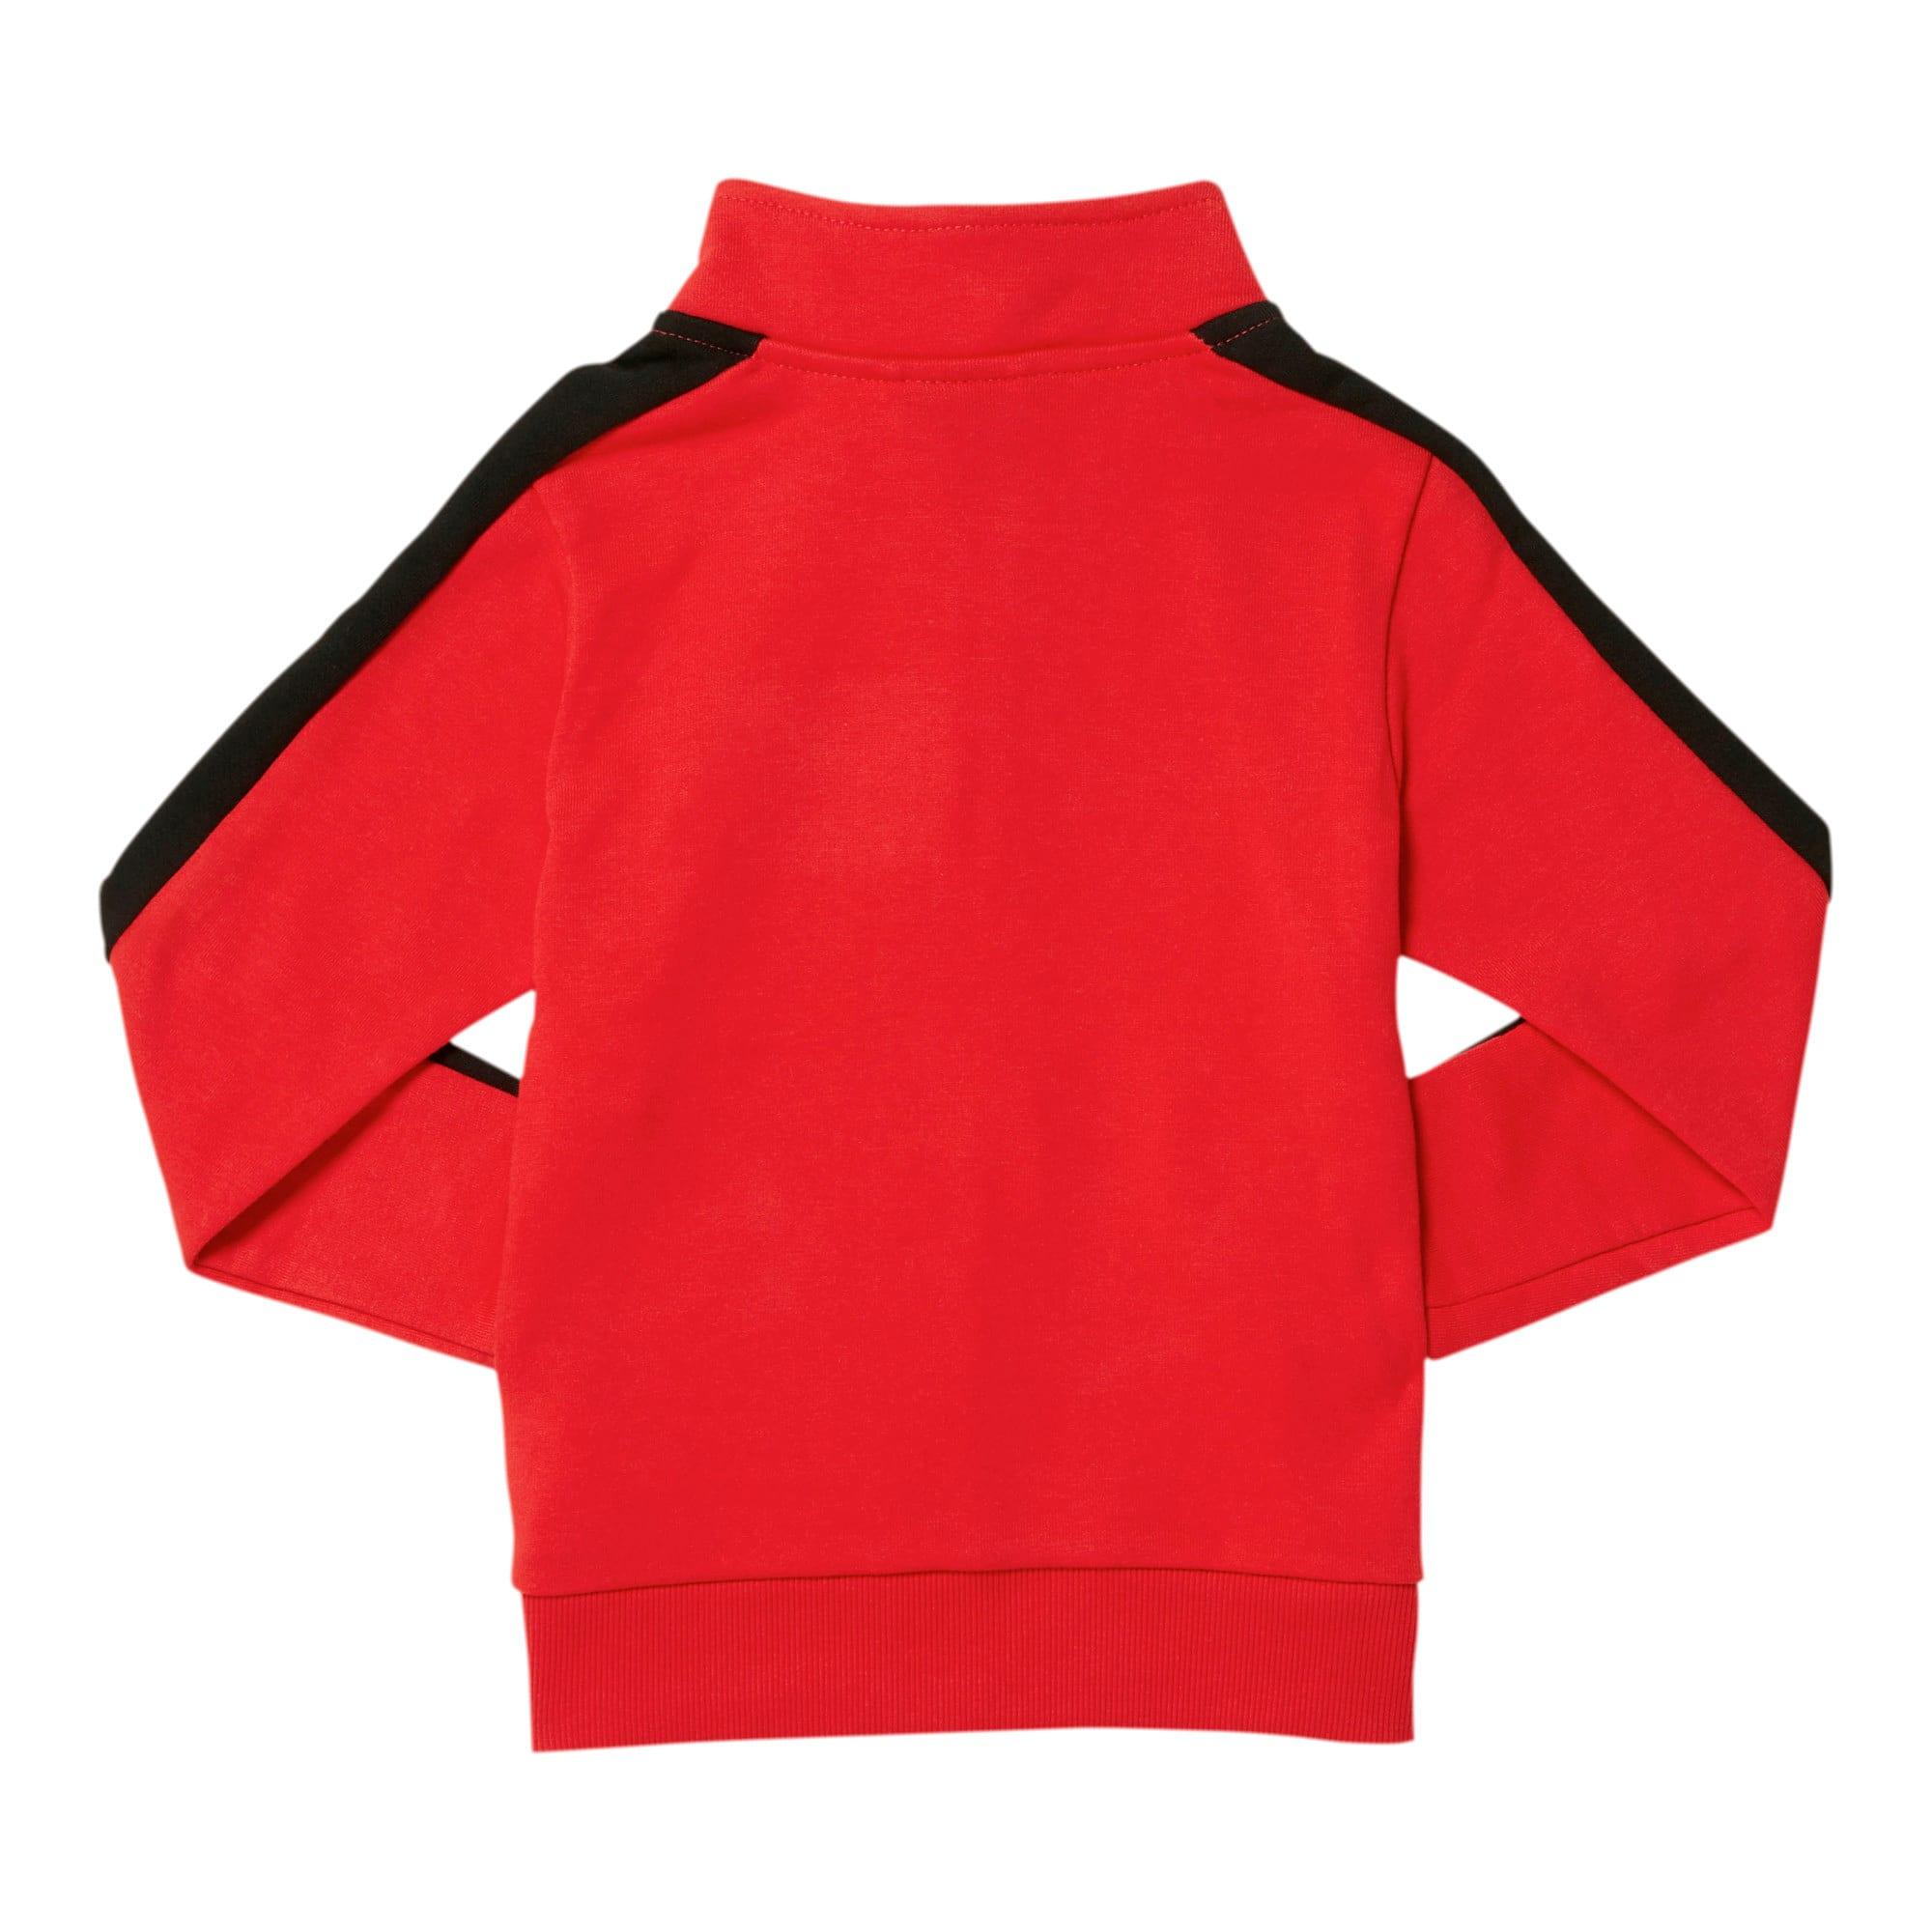 Thumbnail 2 of Little Kids' T7 Track Jacket, HIGH RISK RED, medium